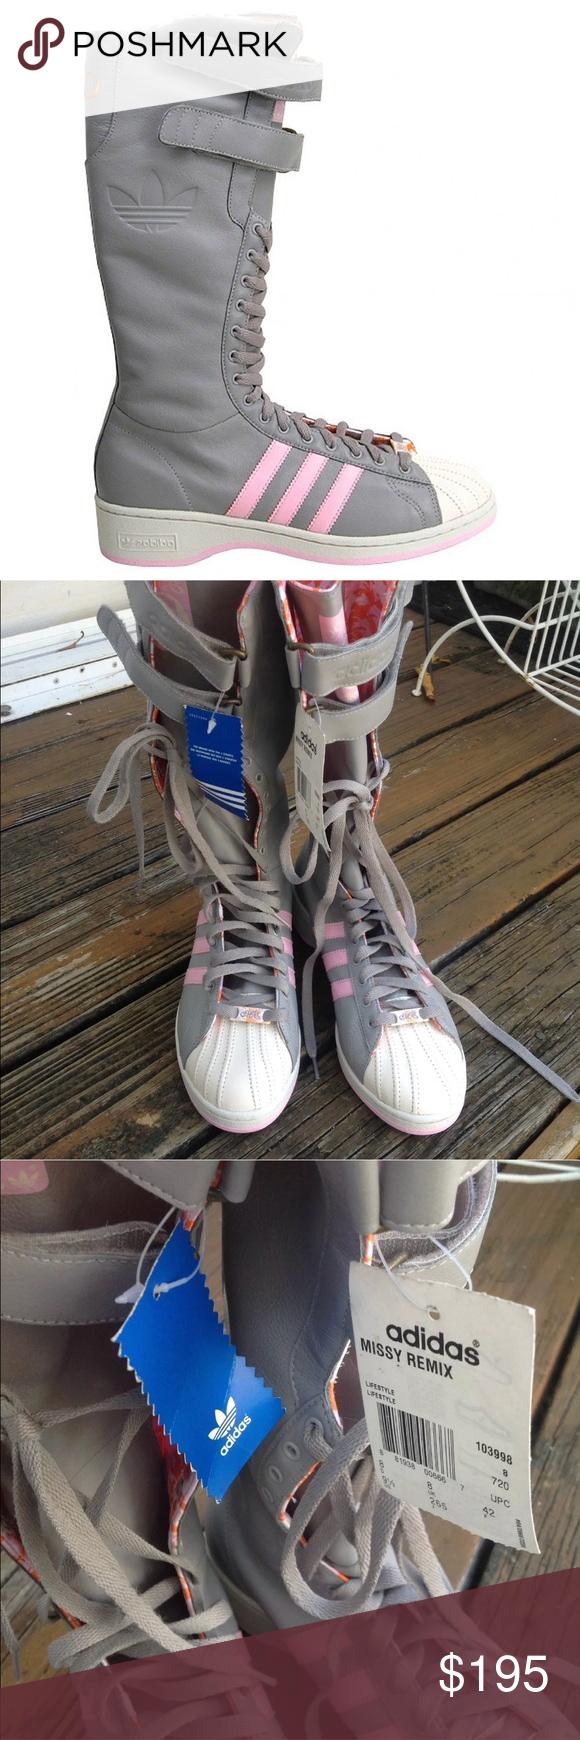 Adidas Missy Elliot Remix Boots Sneakers 9.5 EU42 Adidas